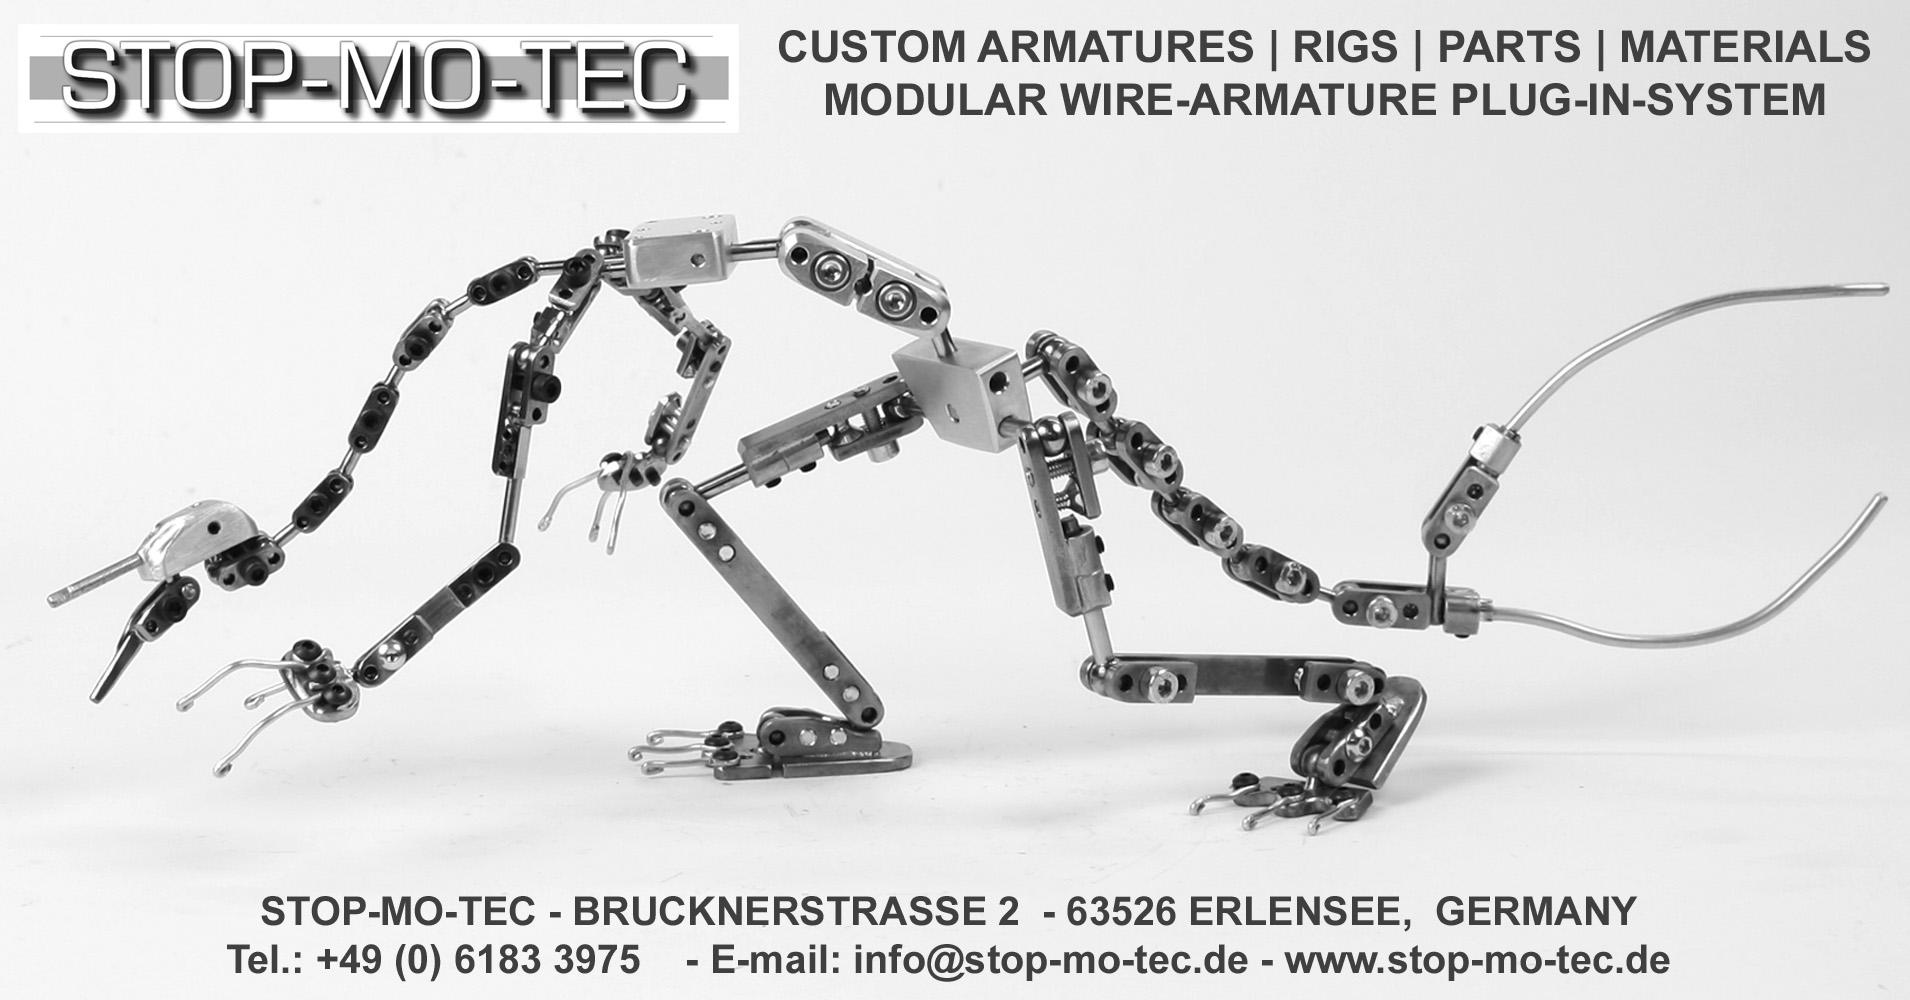 STOP-MO-TEC Stop-Motion-Shop Armature Kits, Stop-Motion Rigs